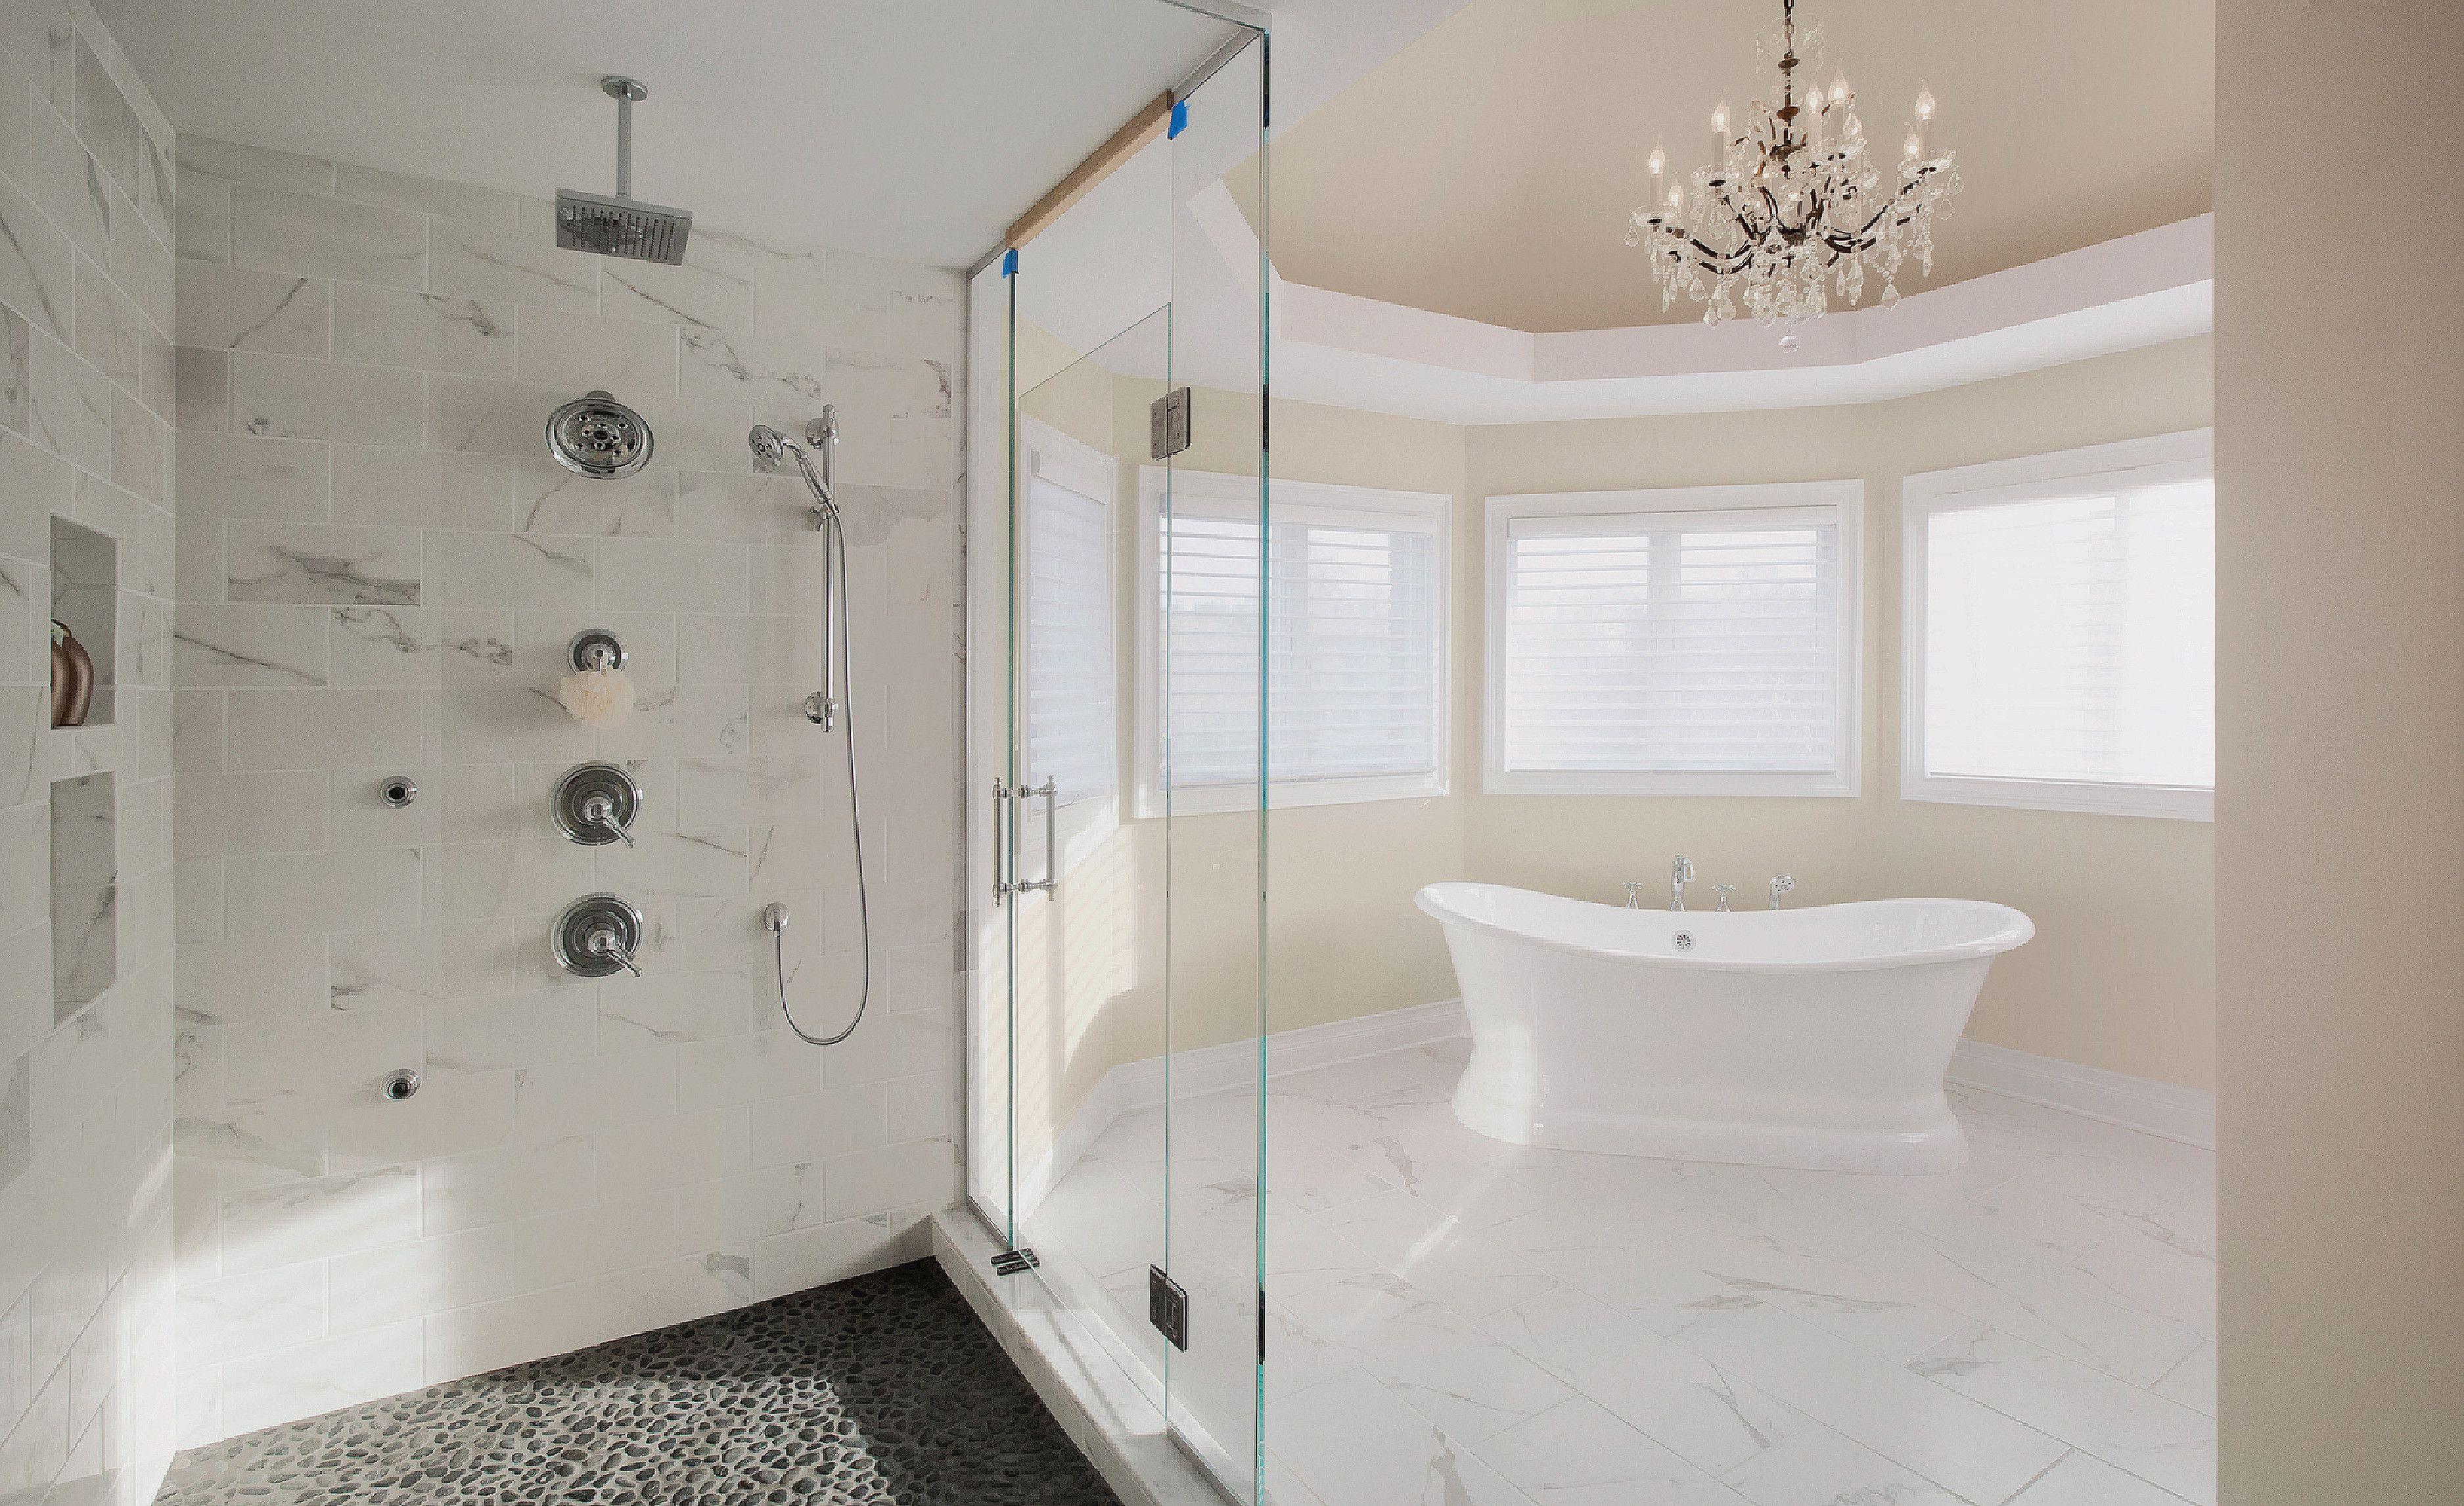 Bathroom Design Ideas In Kerala - Decor Design